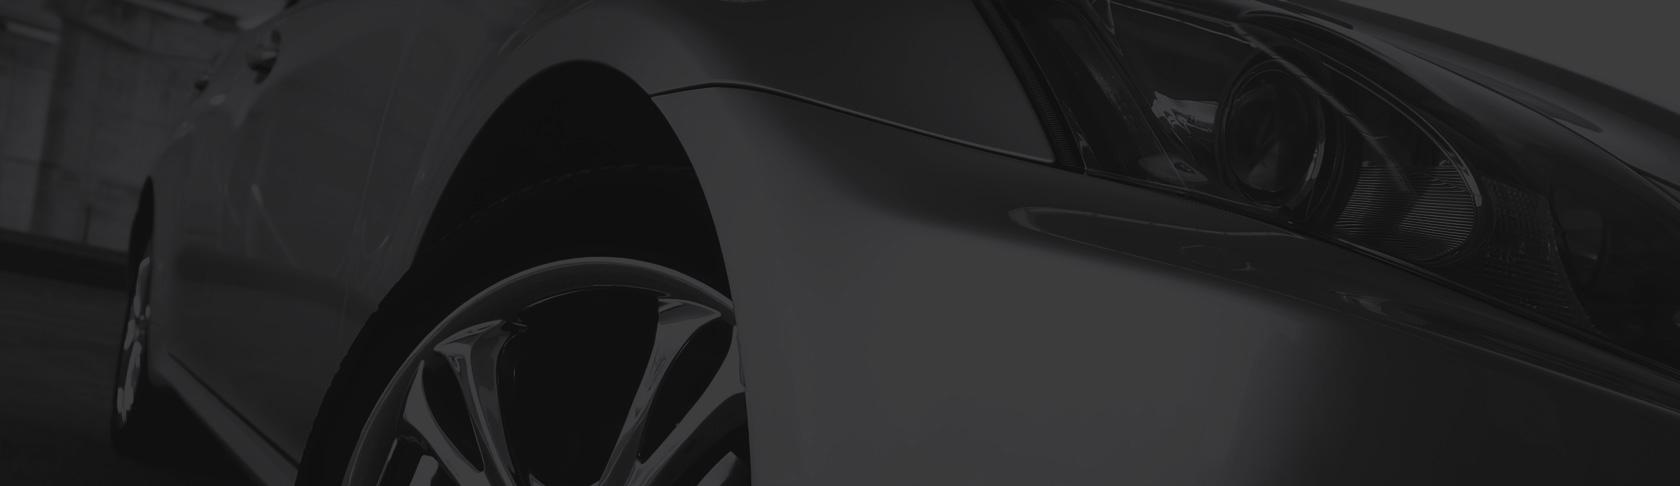 silver-car-banner-img.jpg